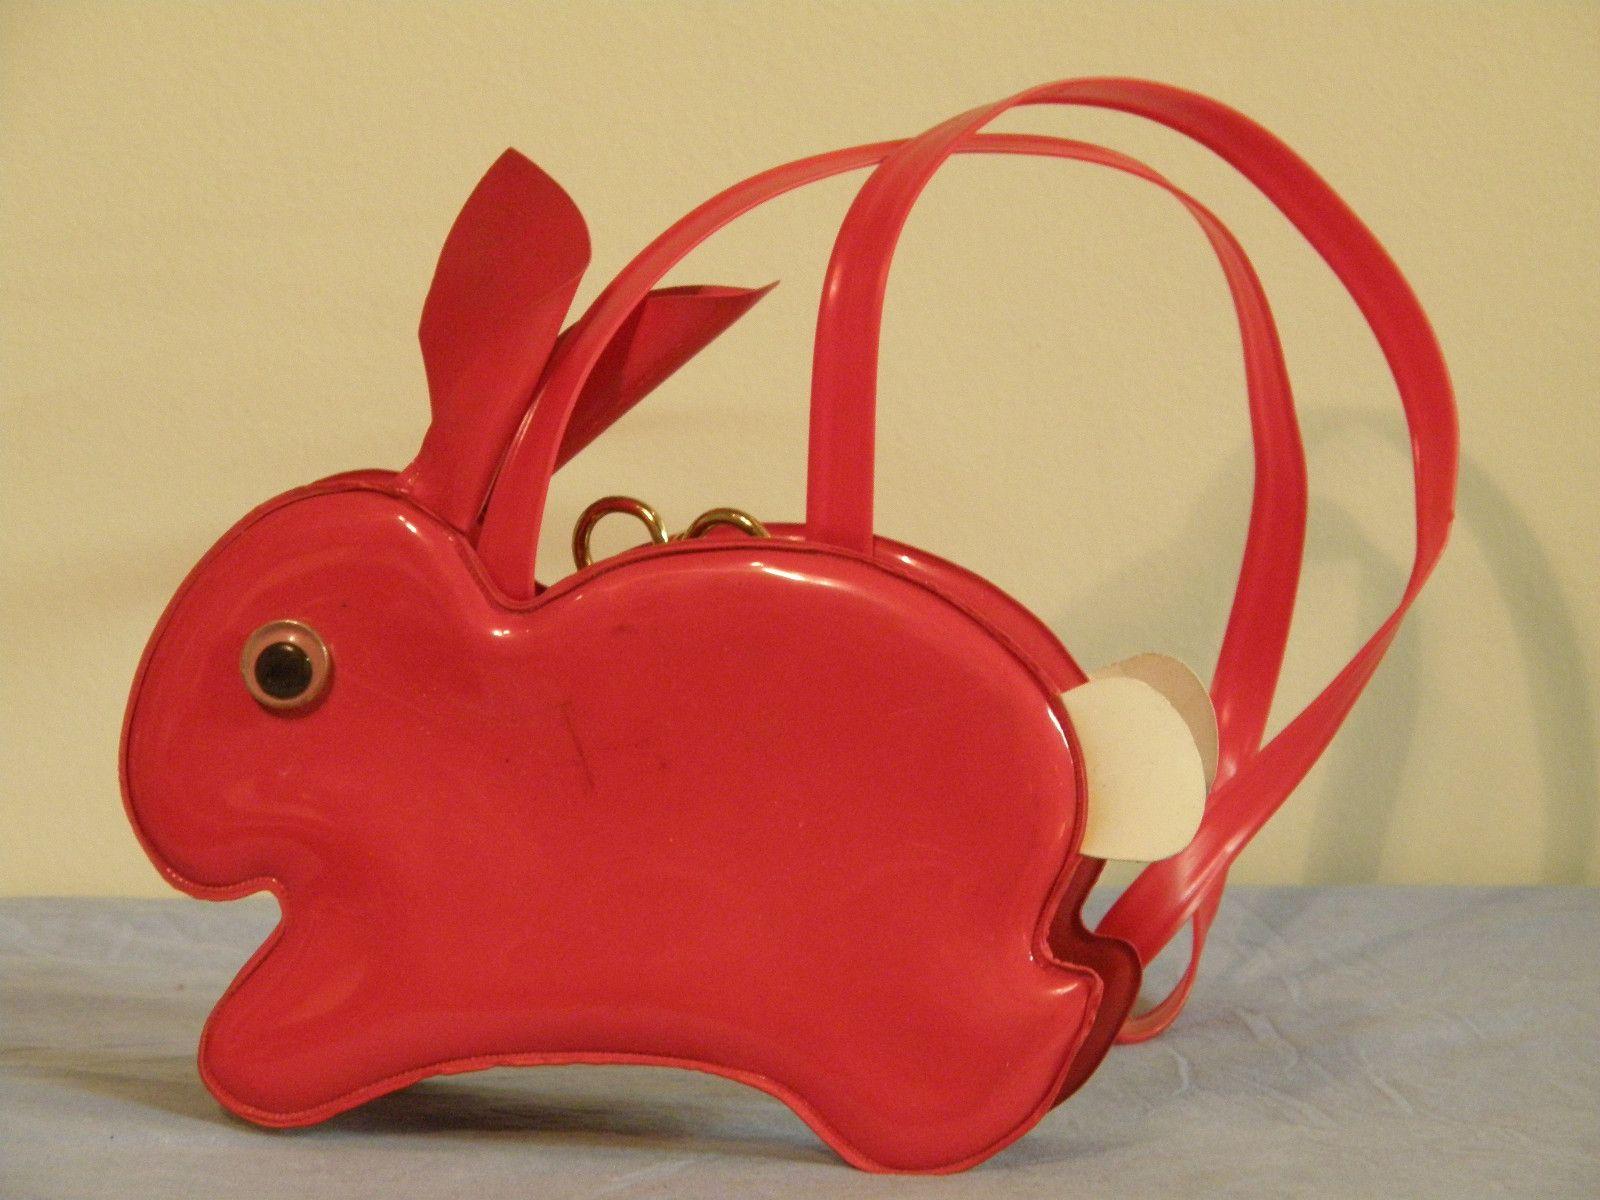 Vintage 1970 S Vinyl Red Rabbit Kids Purse Plastic Moving Eyes In 2020 Vintage Childrens Clothing Vintage Handbags Kids Purse